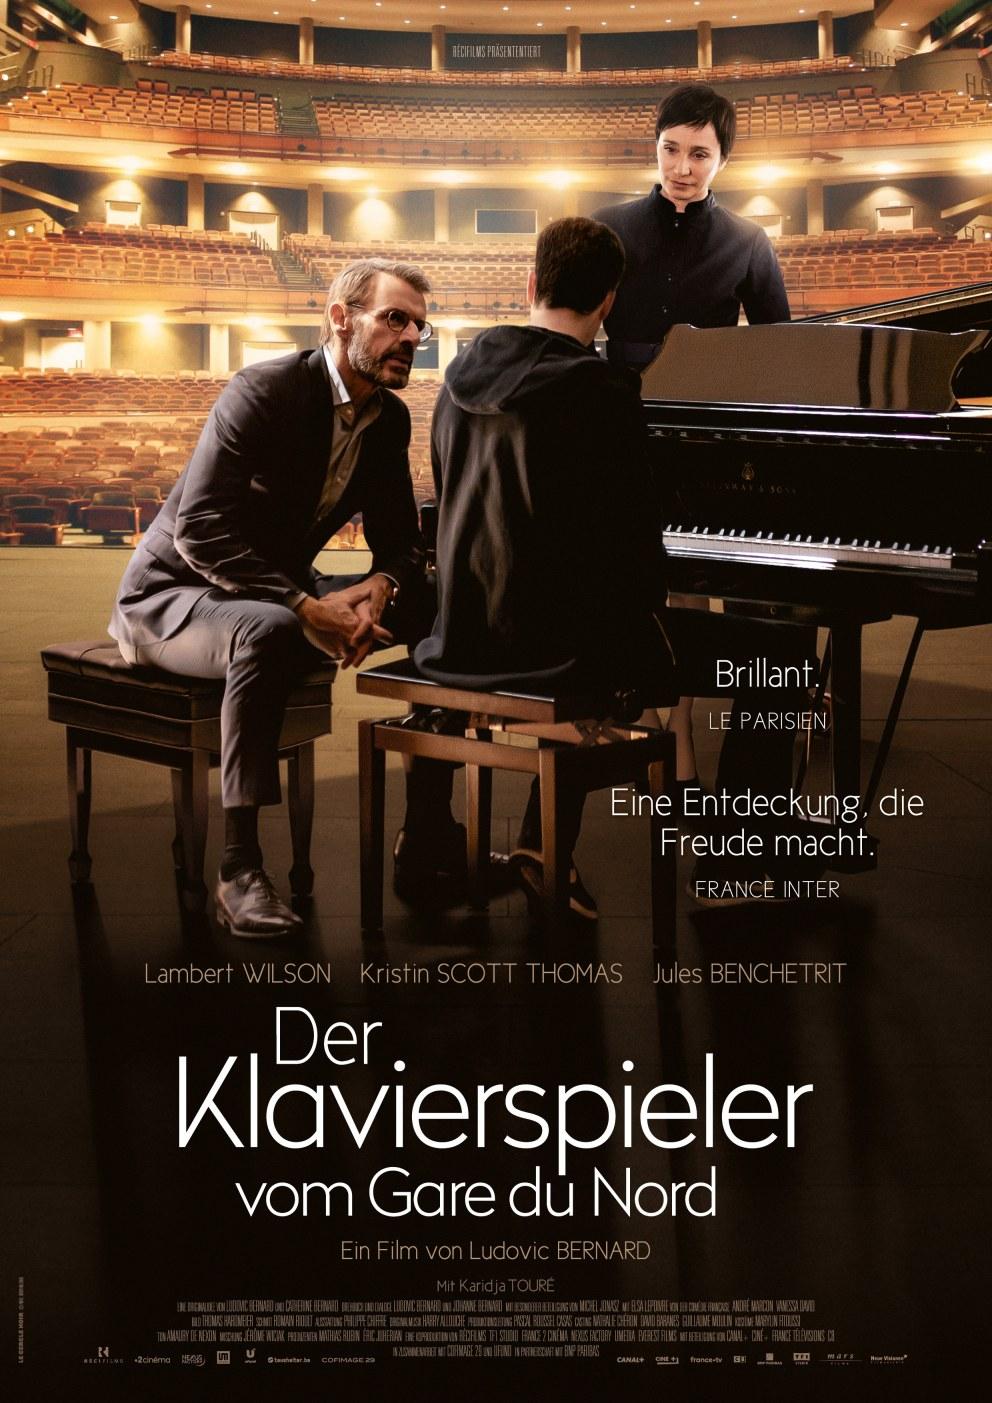 Cinestar Leipzig Kinoprogramm